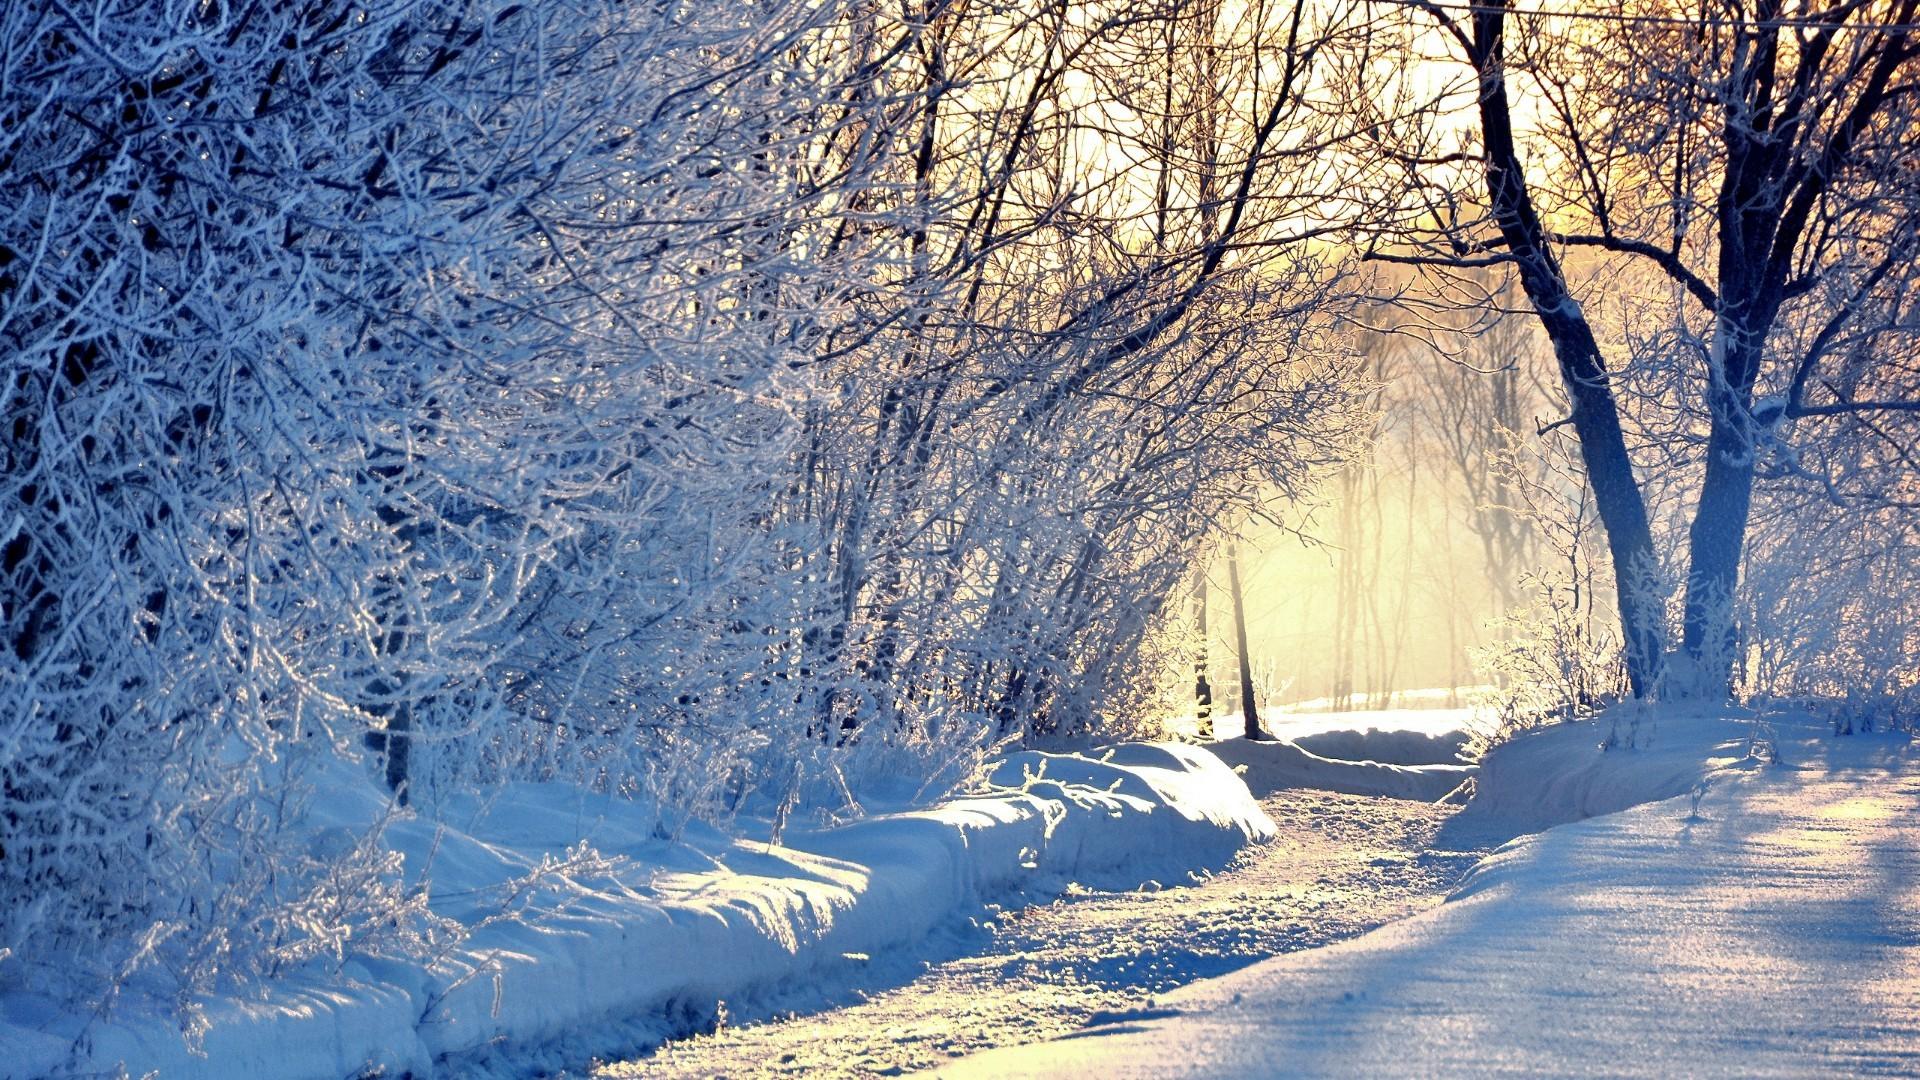 1920x1080, Snowy Winter Forest Wallpaper - Winter Background - HD Wallpaper